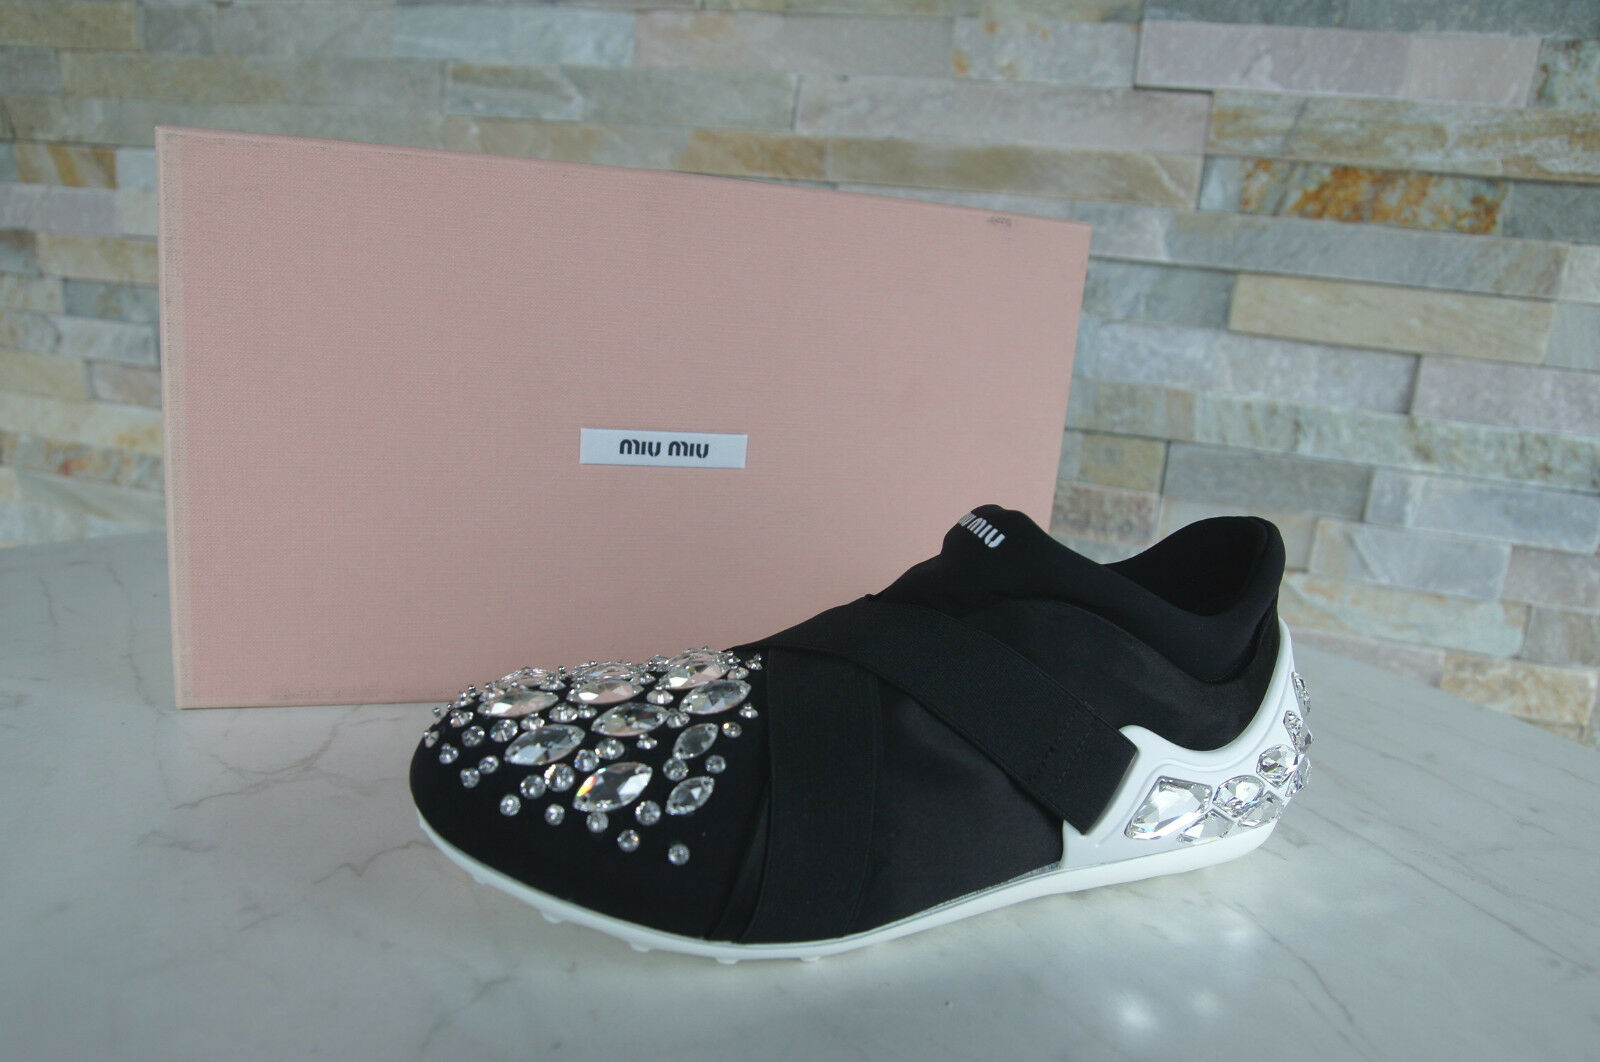 Miu Miu talla 35 Slipper slip-Ons zapatos piedras negro 5s583a 5s583a 5s583a nuevo ex PVP f25940